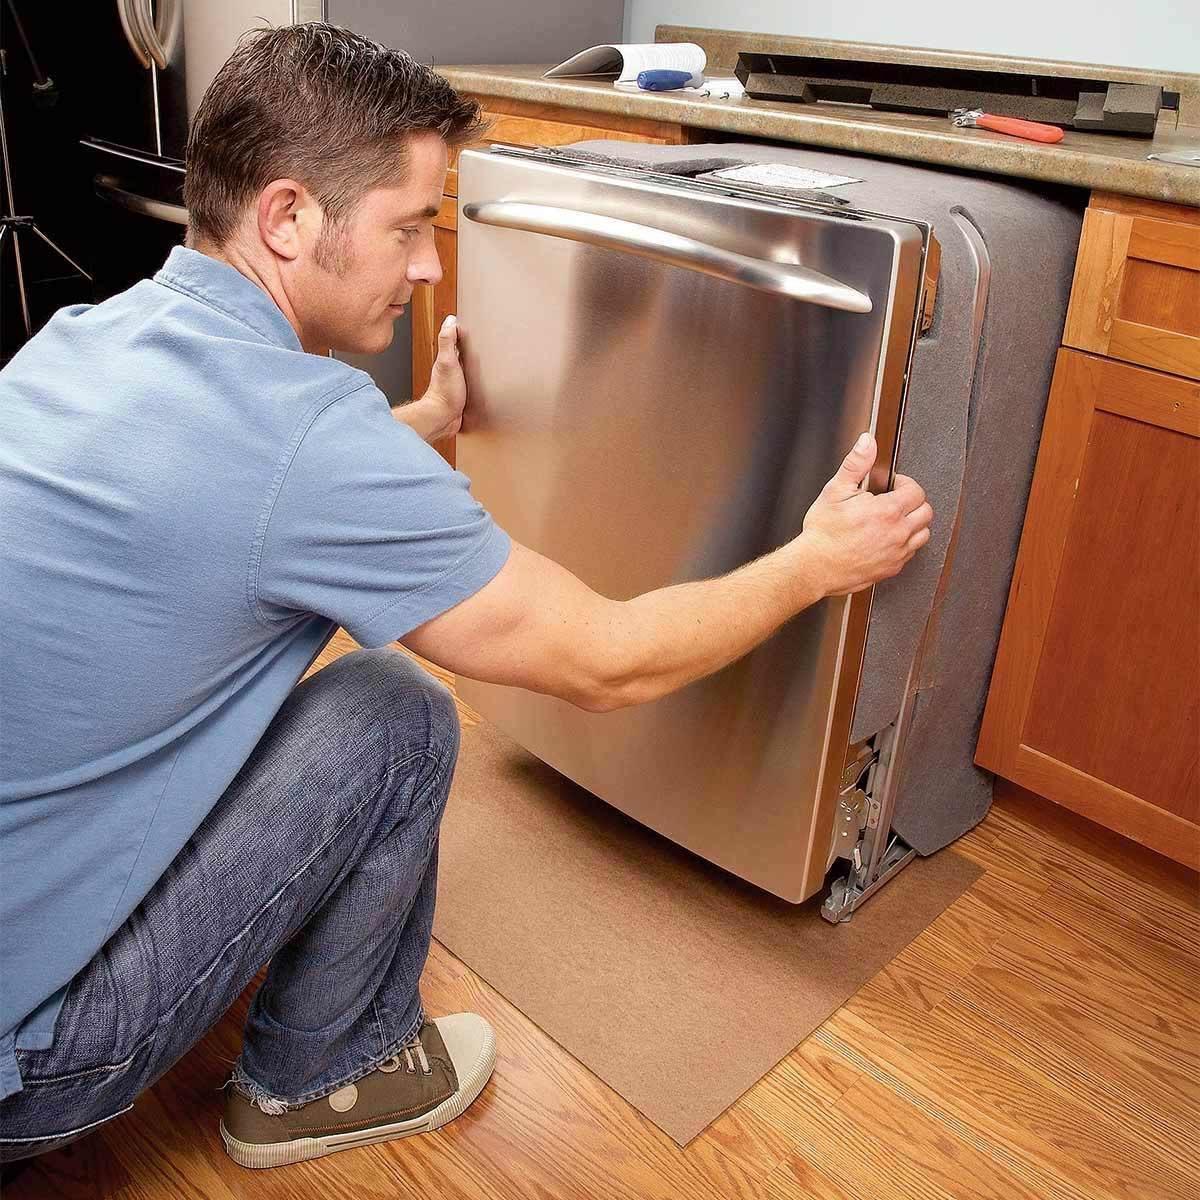 Dishwasher removal installation